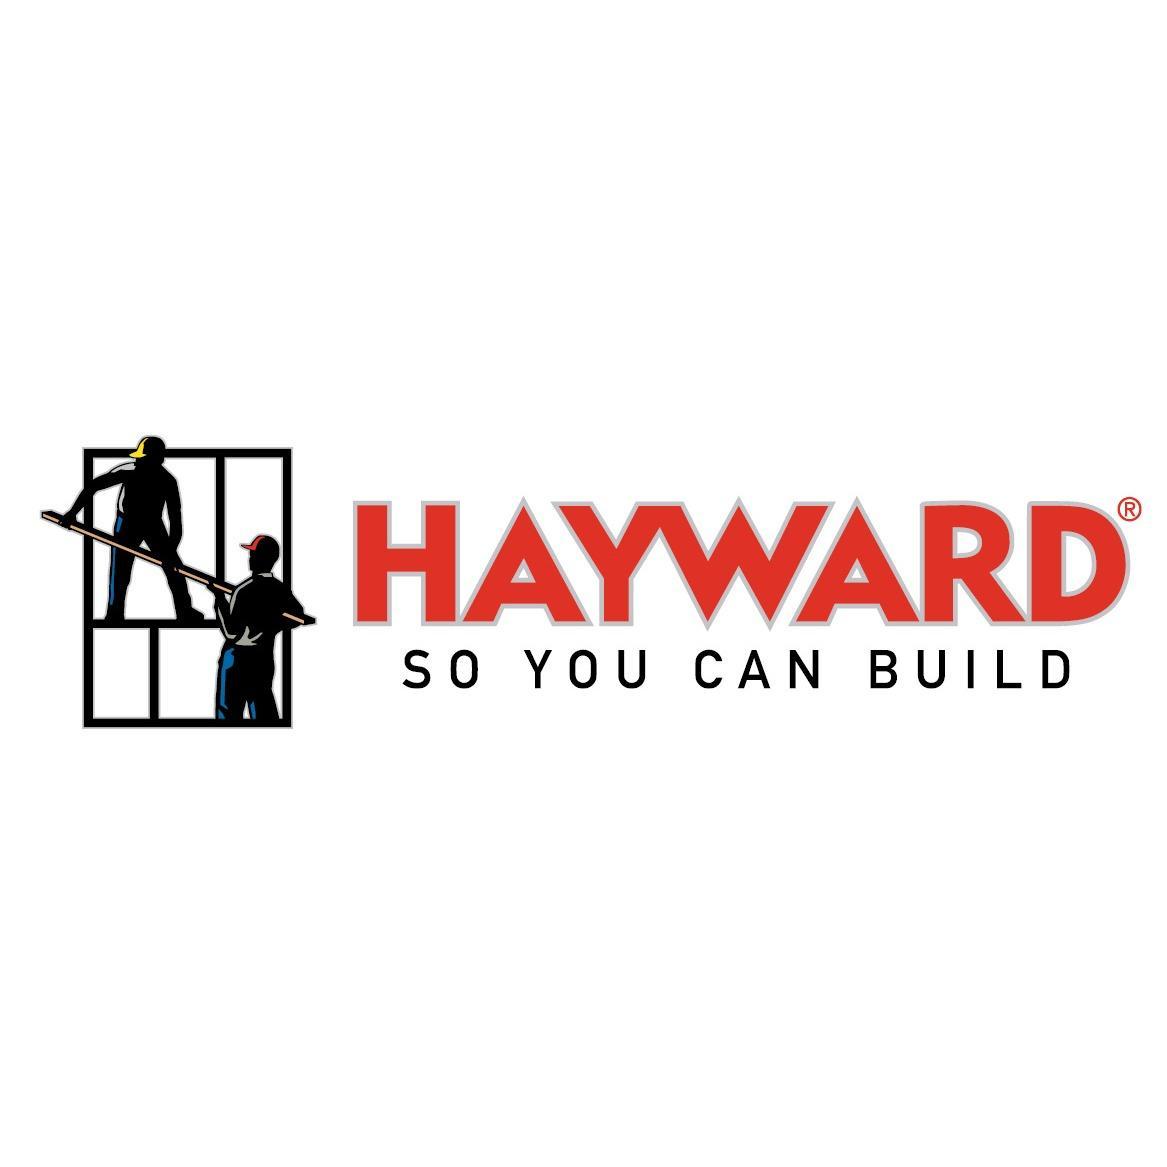 Hayward Lumber - Goleta image 5